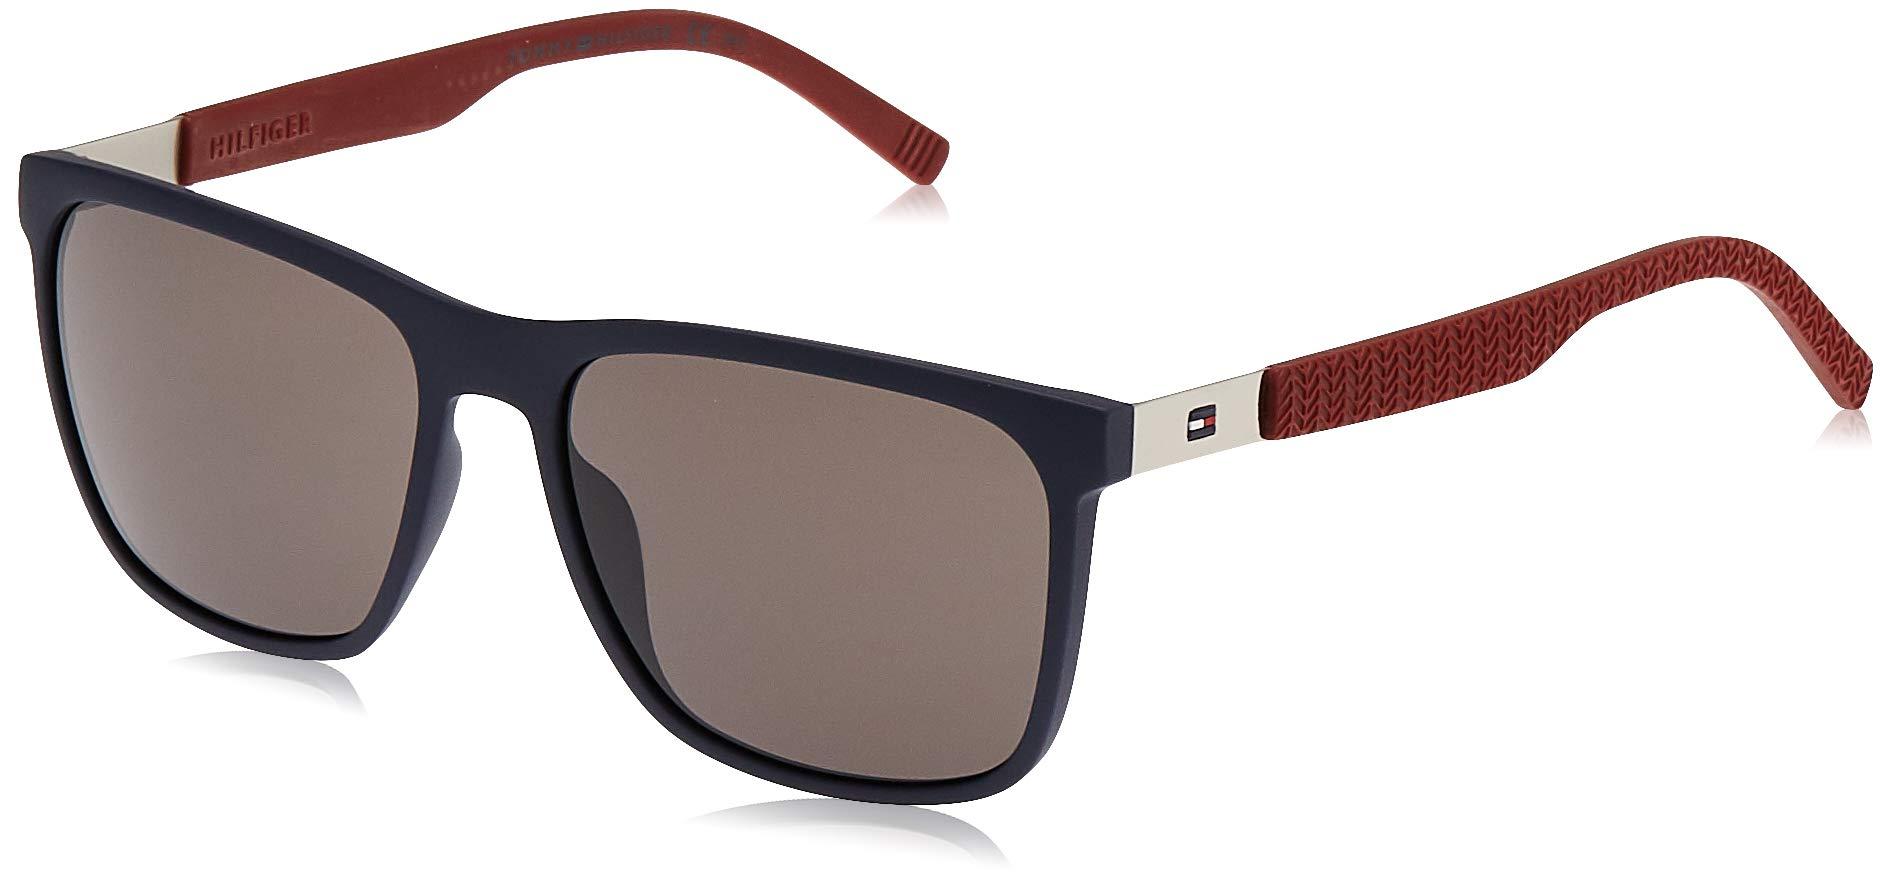 Tommy Hilfiger Men's Th1445/S Rectangular Sunglasses